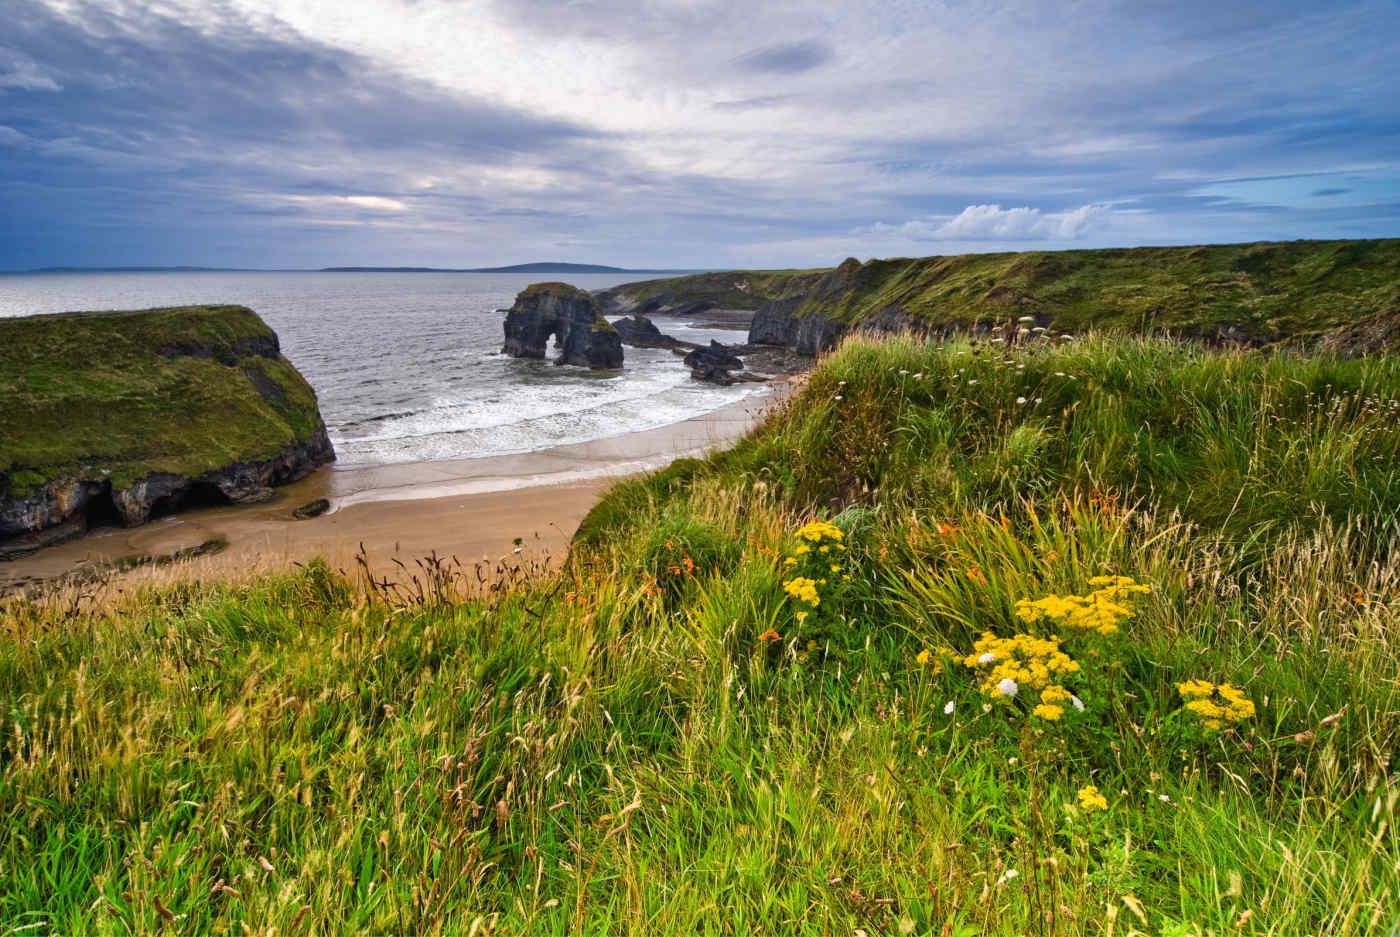 Cliffs over the Atlantic